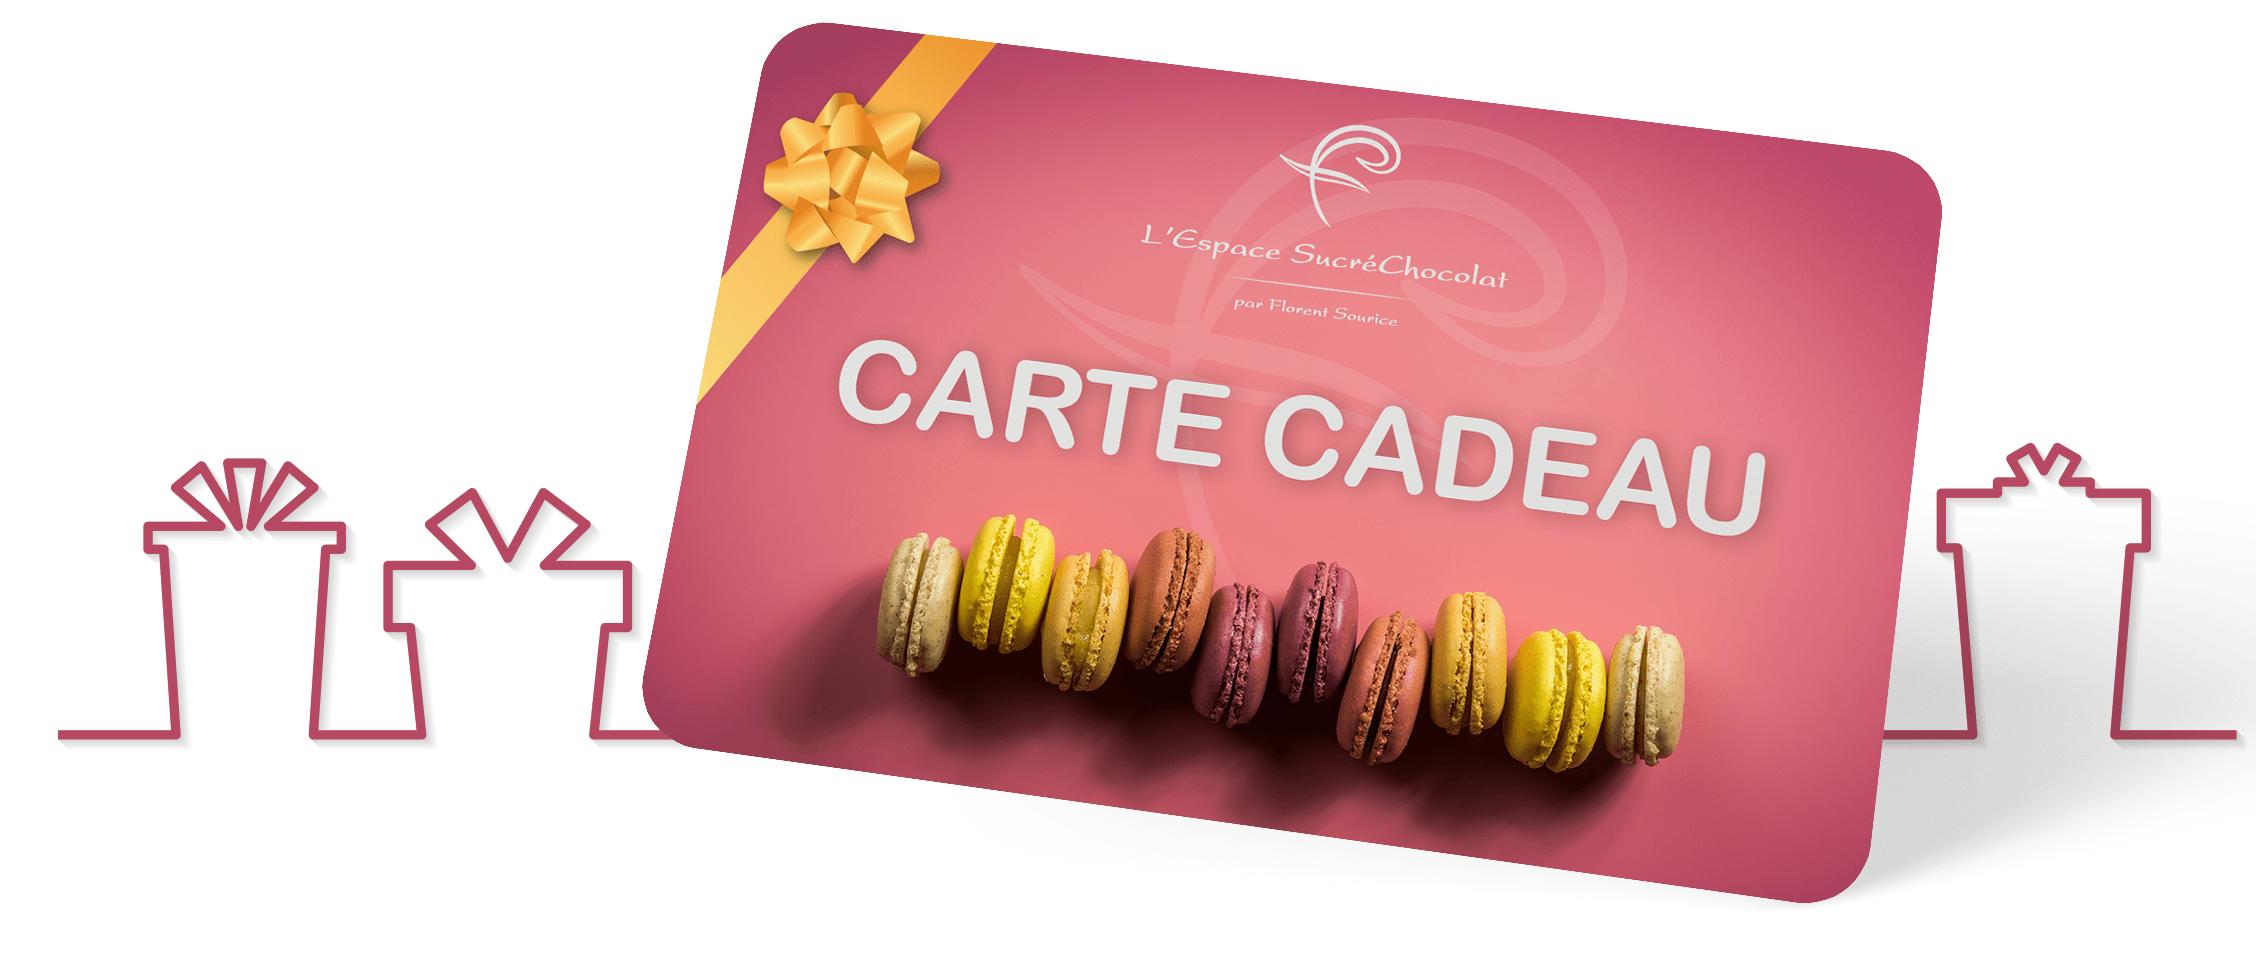 espace-sucrechocolat-carte-cadeau-accueil